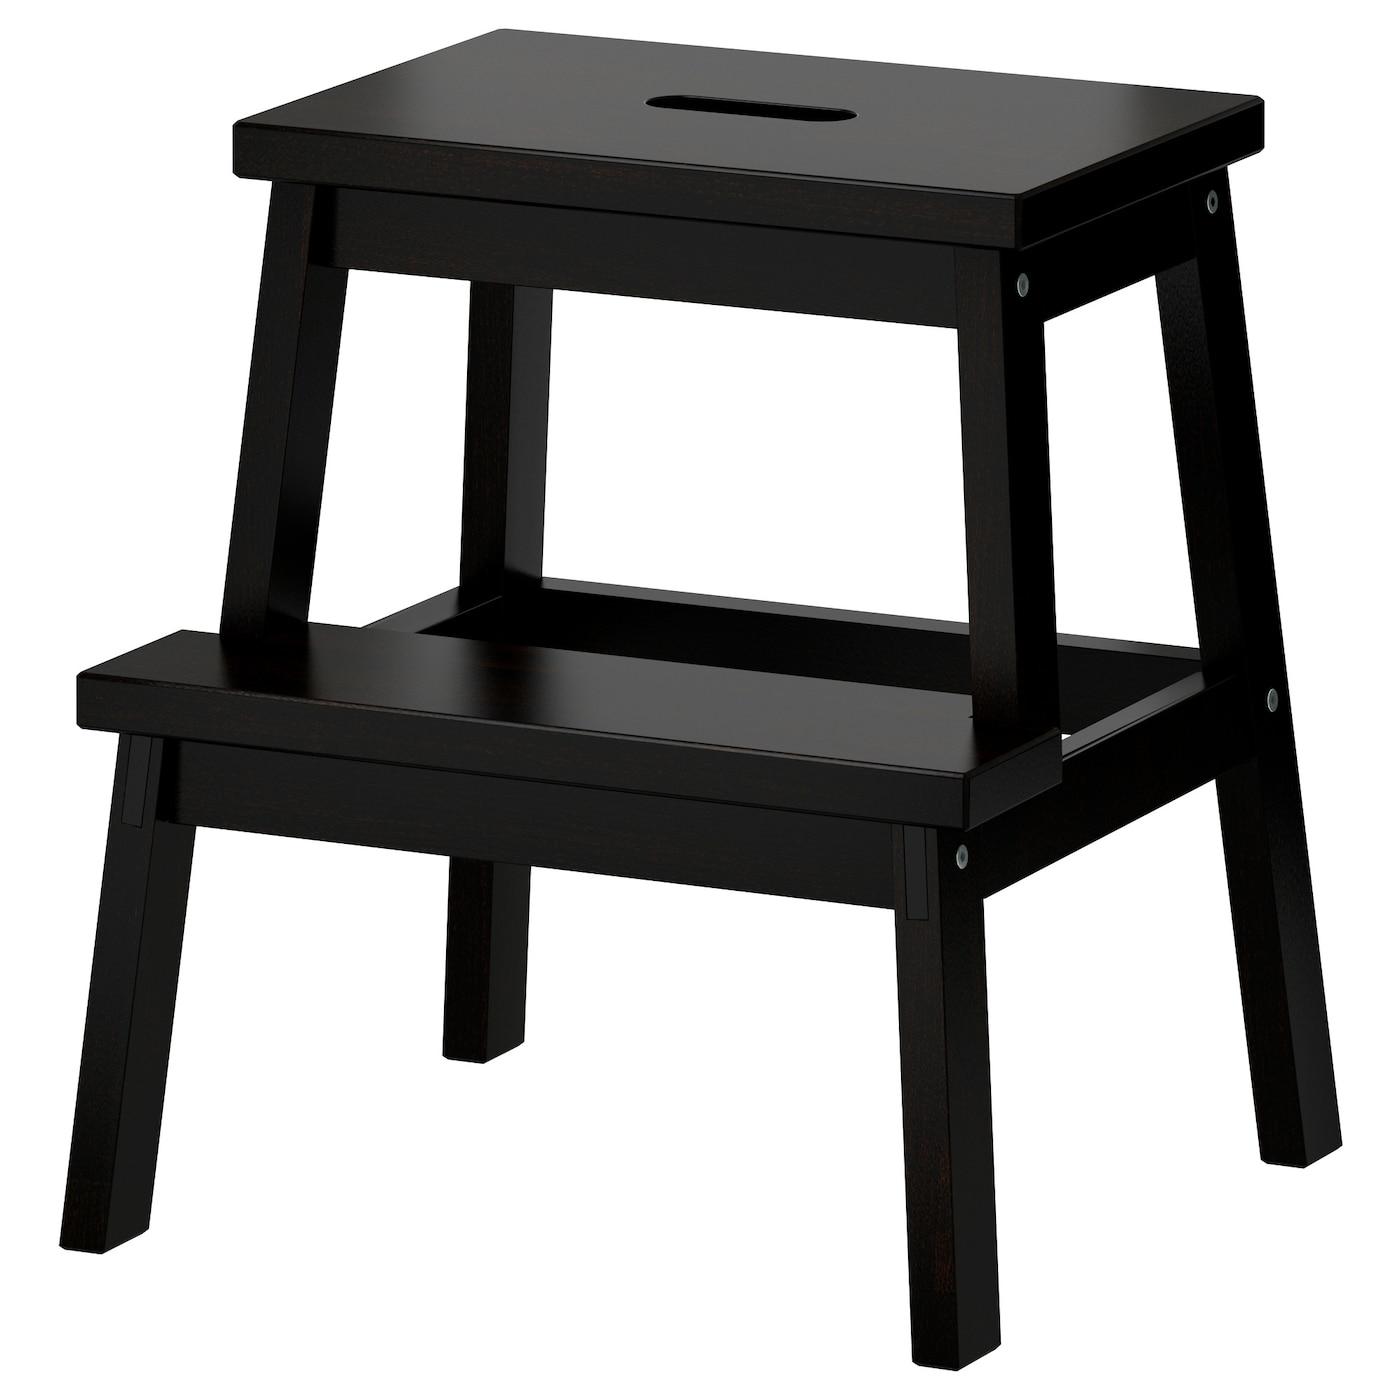 Bekv 196 M Taburete Escal 243 N Negro 50 Cm Ikea